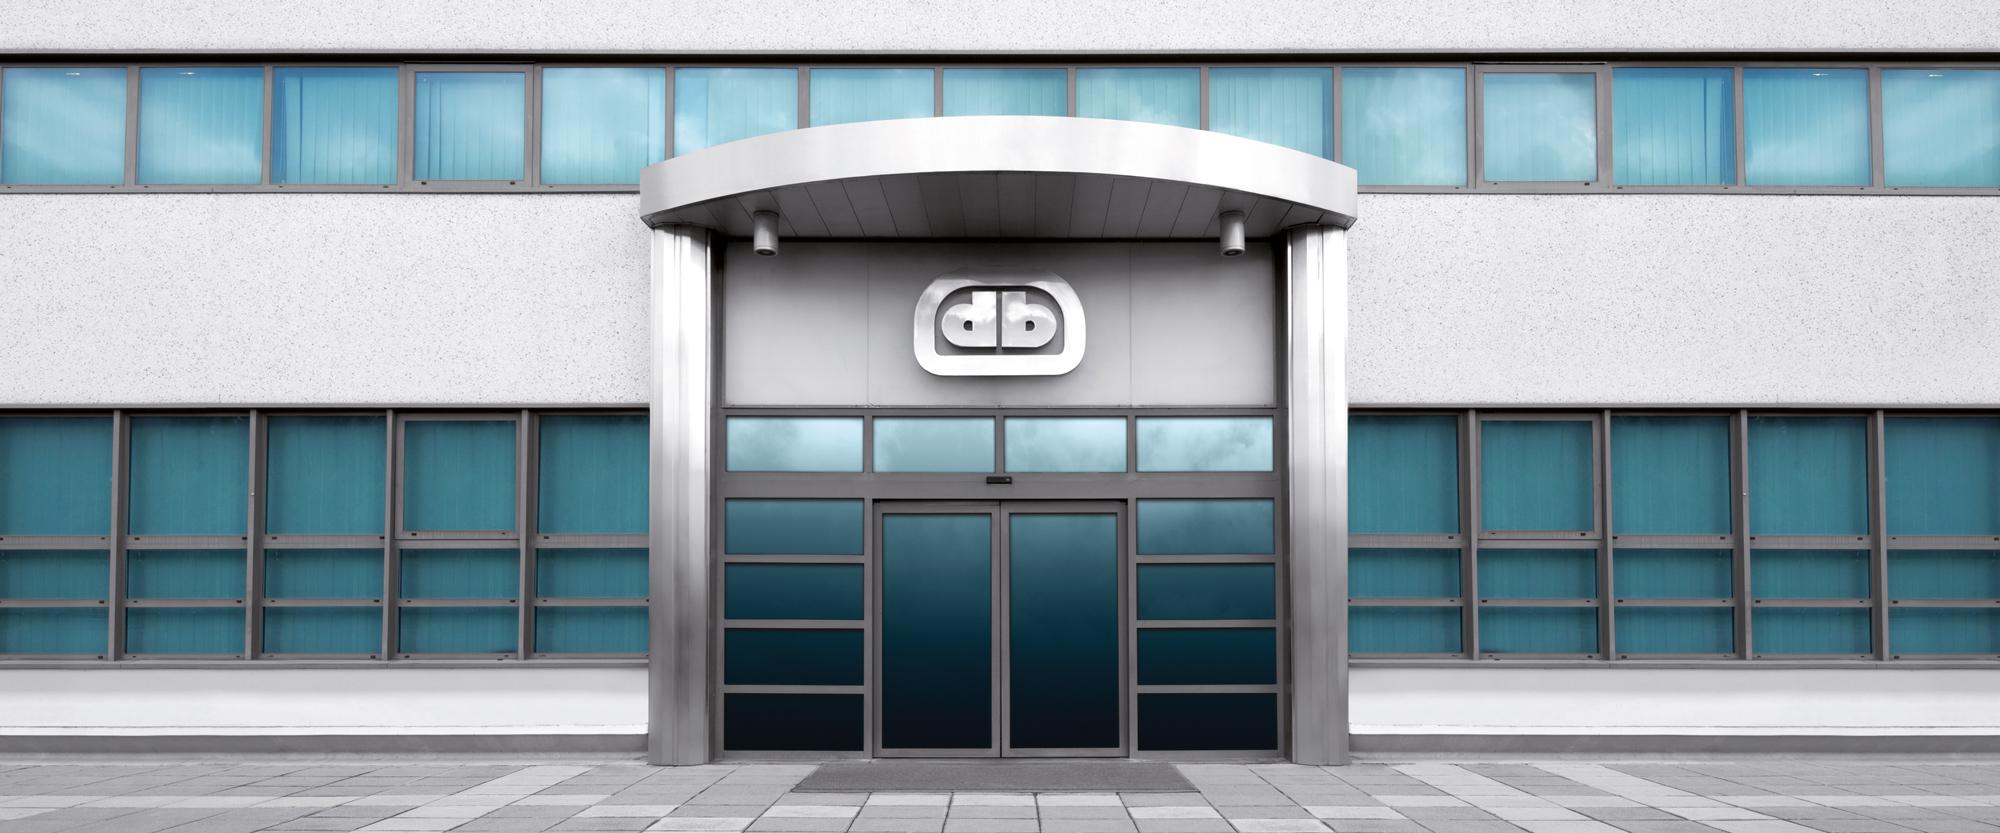 DB Ingegneria dell'Immagine